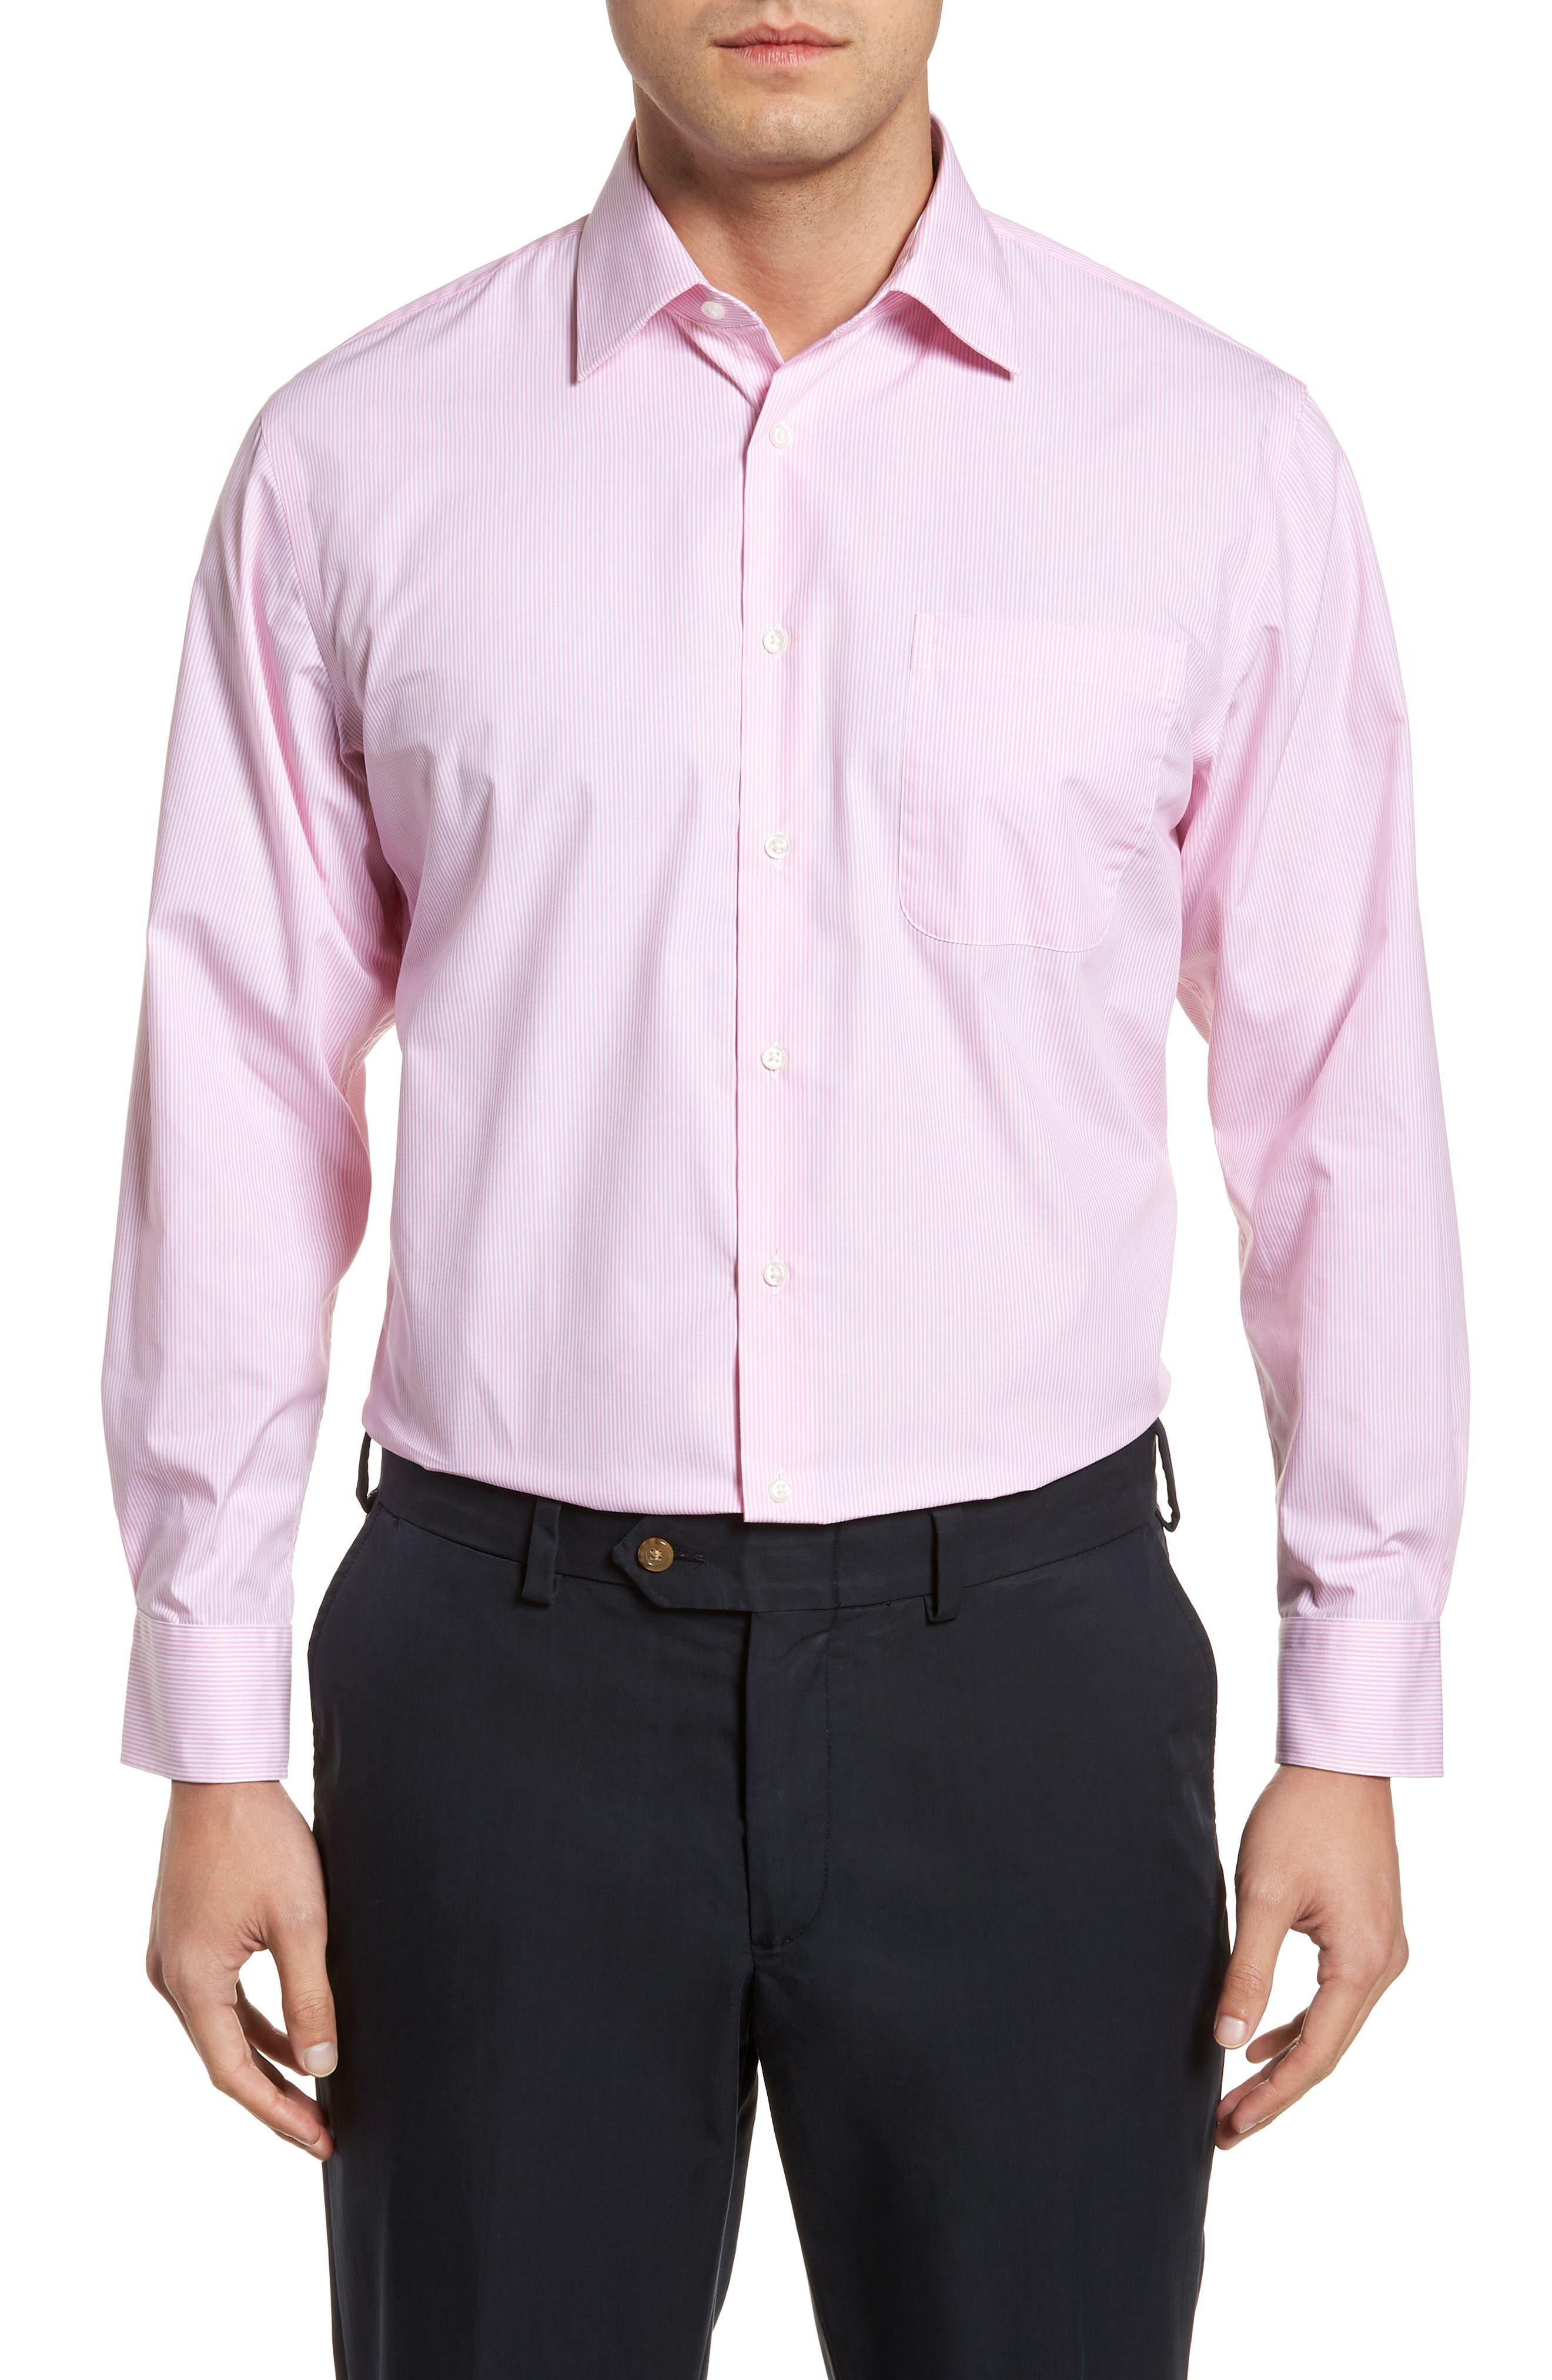 Main Image - Nordstrom Men's Shop Smartcare™ Traditional Fit Stripe Dress Shirt